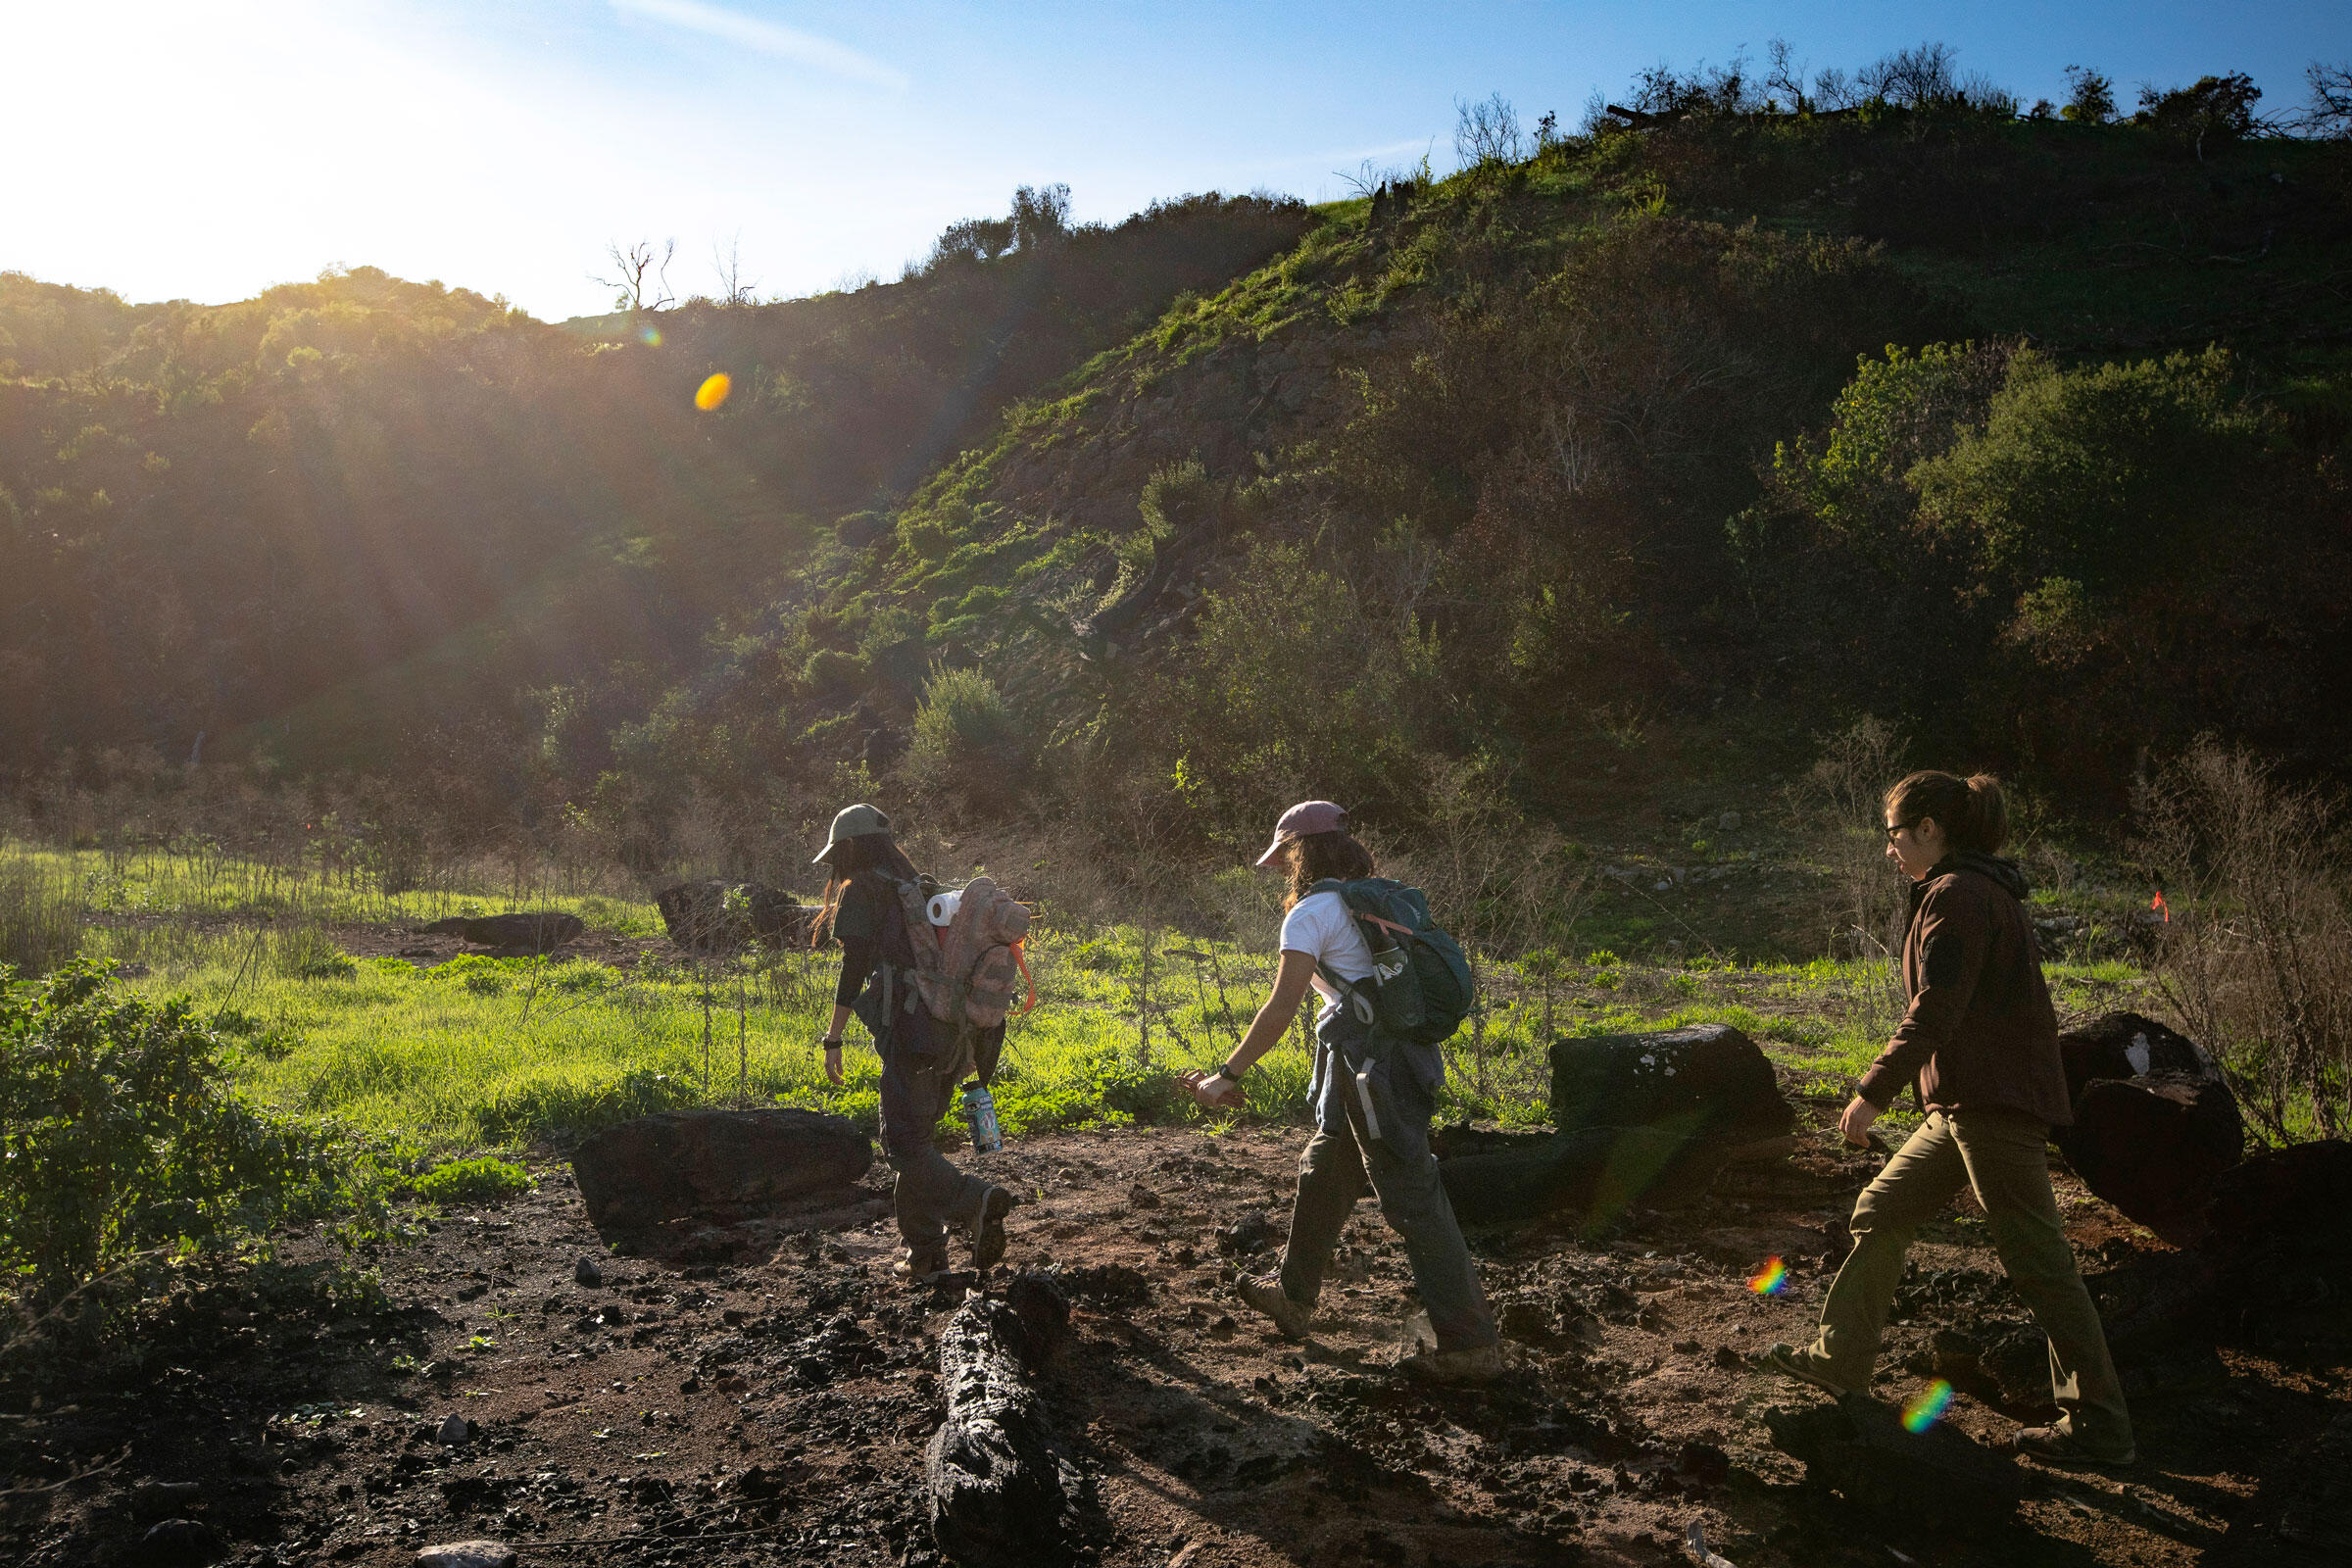 Minerva Rivera, Carina Motta, and Evelyn Bobadilla trek through the 260-acre burn scar on California's Santa Cruz Island. Morgan Heim